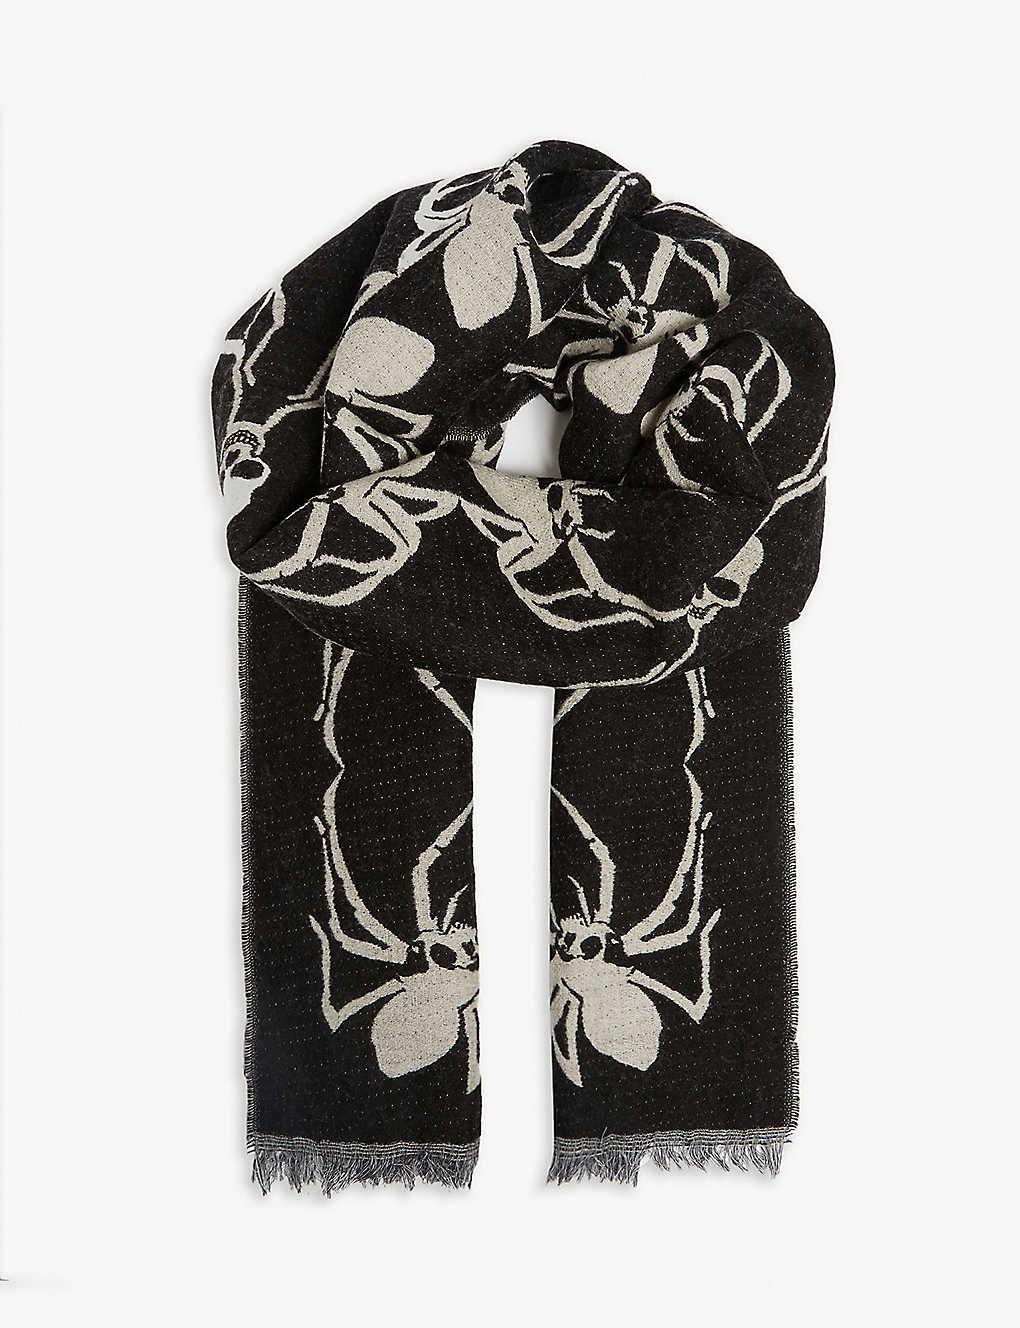 ac20482bee THE KOOPLES - Spider and skull print scarf | Selfridges.com